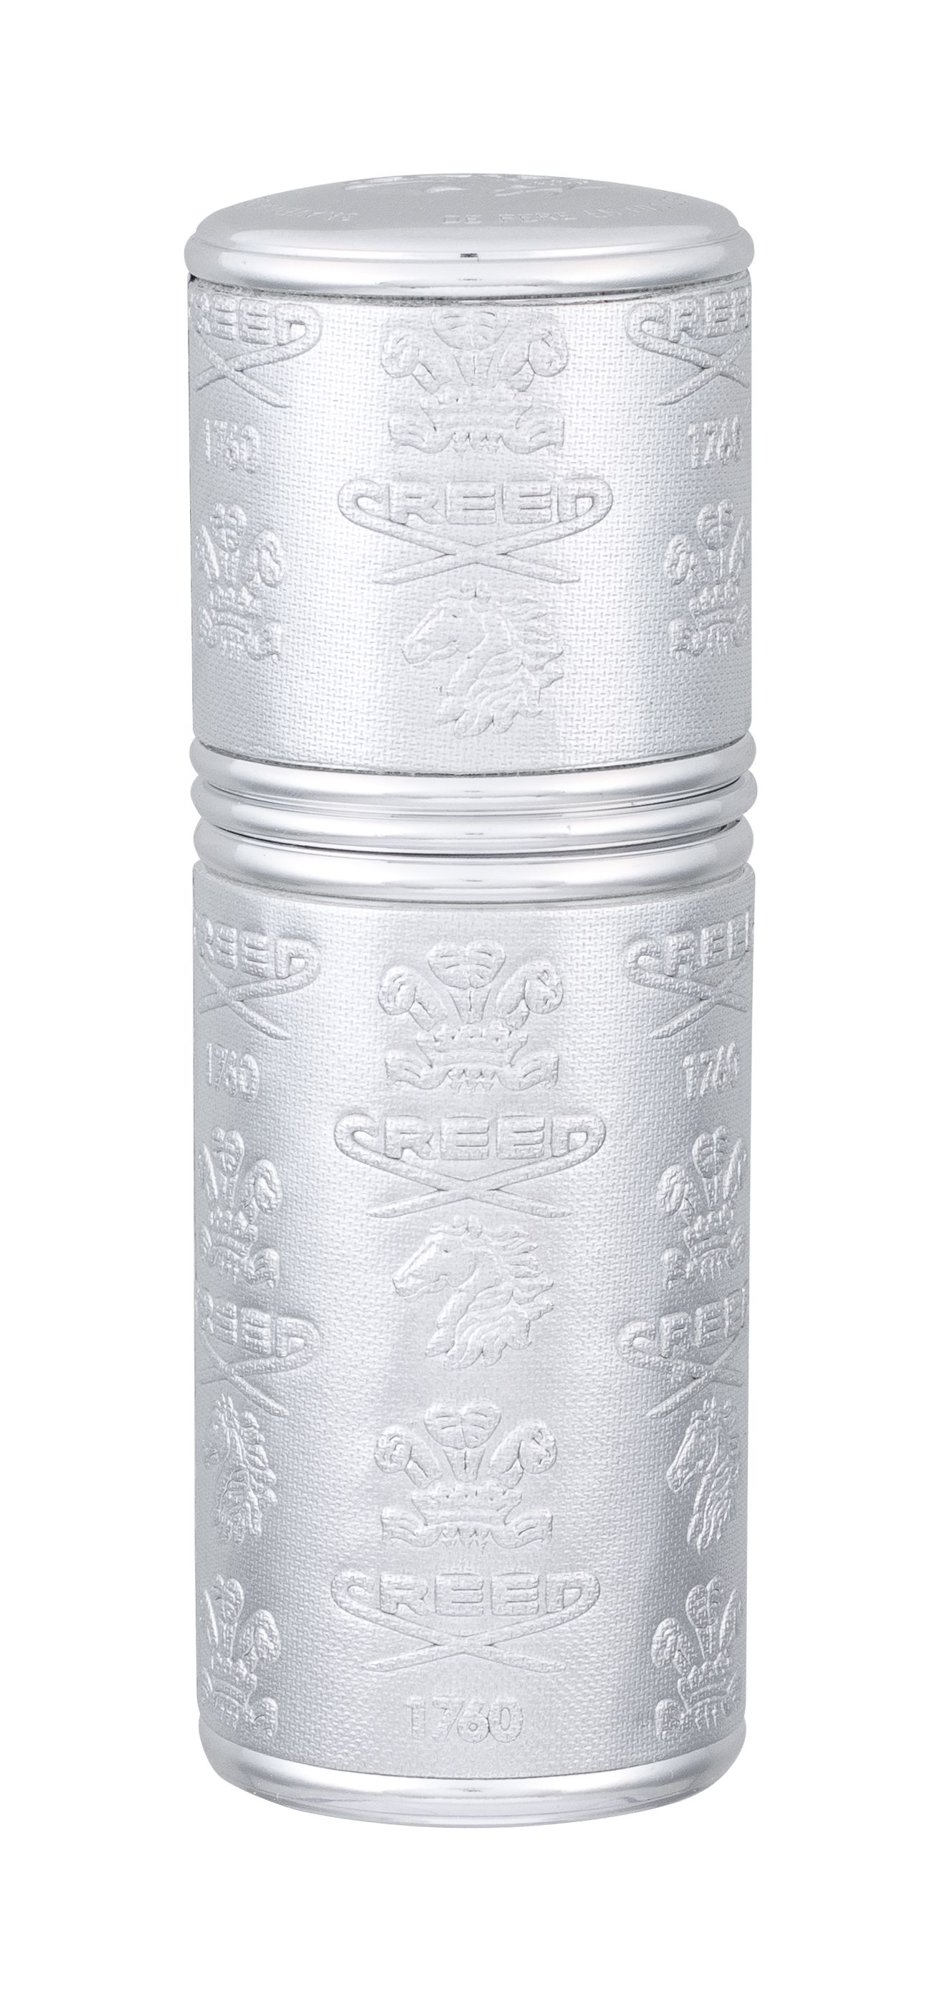 Creed Atomiser Refillable 50ml Silver/Silver